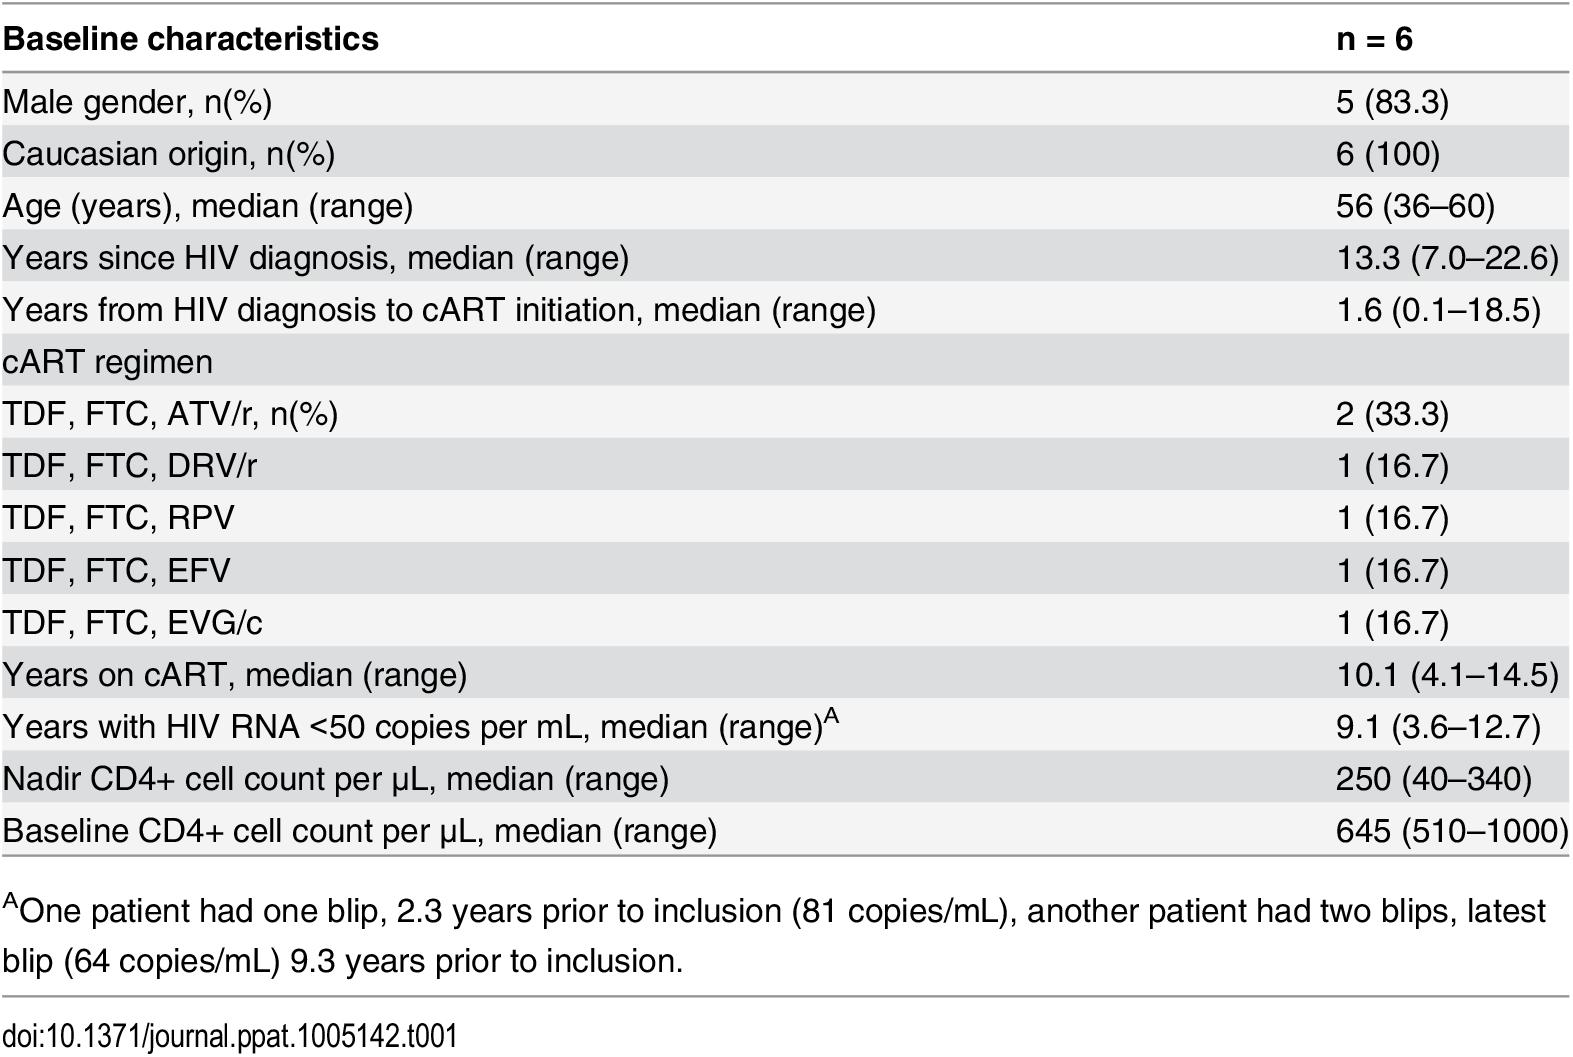 Baseline characteristics of the six study participants at enrolment.